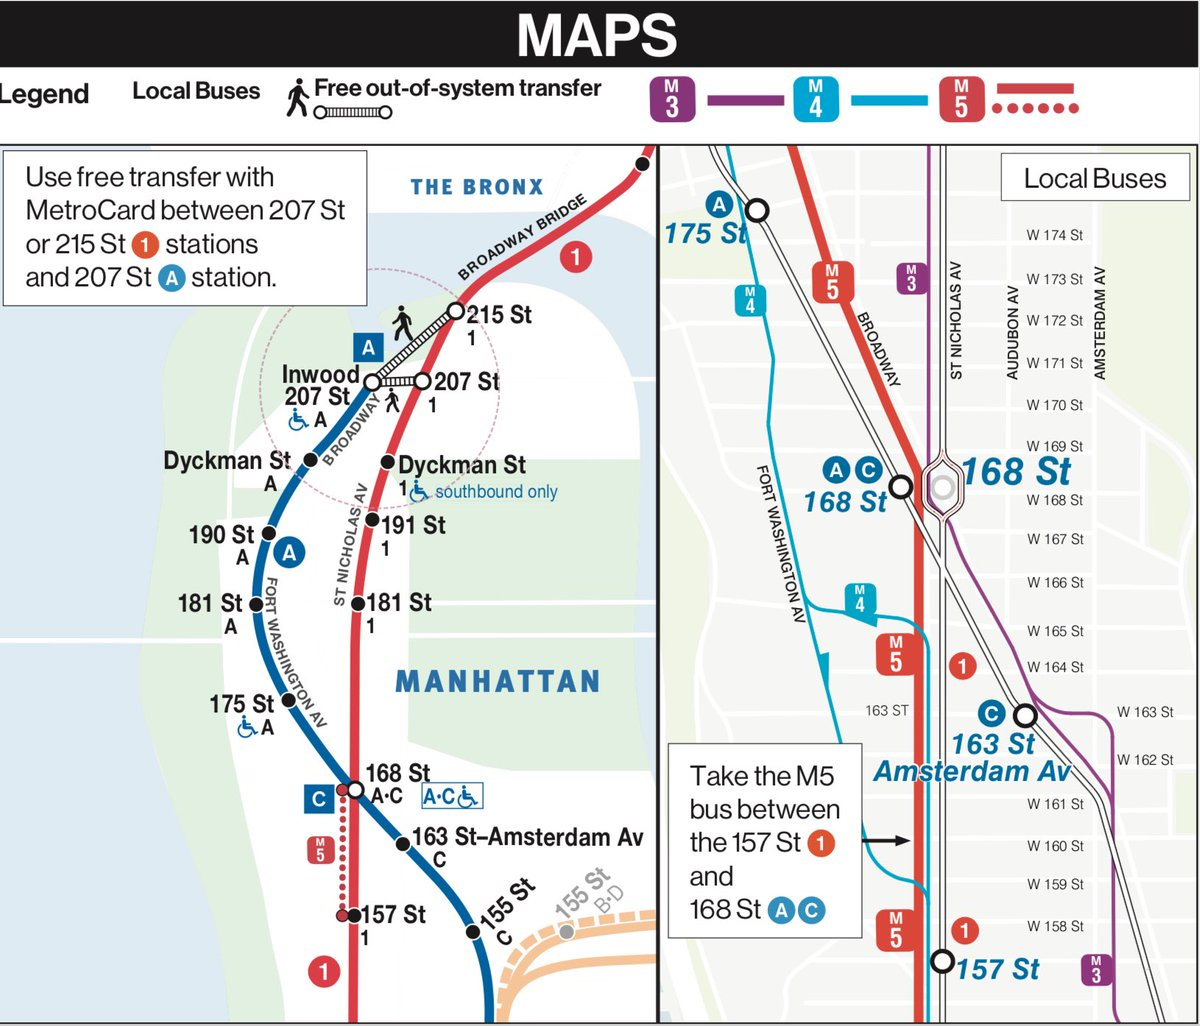 Mta Subway Map Elevators.Nyct Subway On Twitter Reminder Beginning Tonight At Midnight